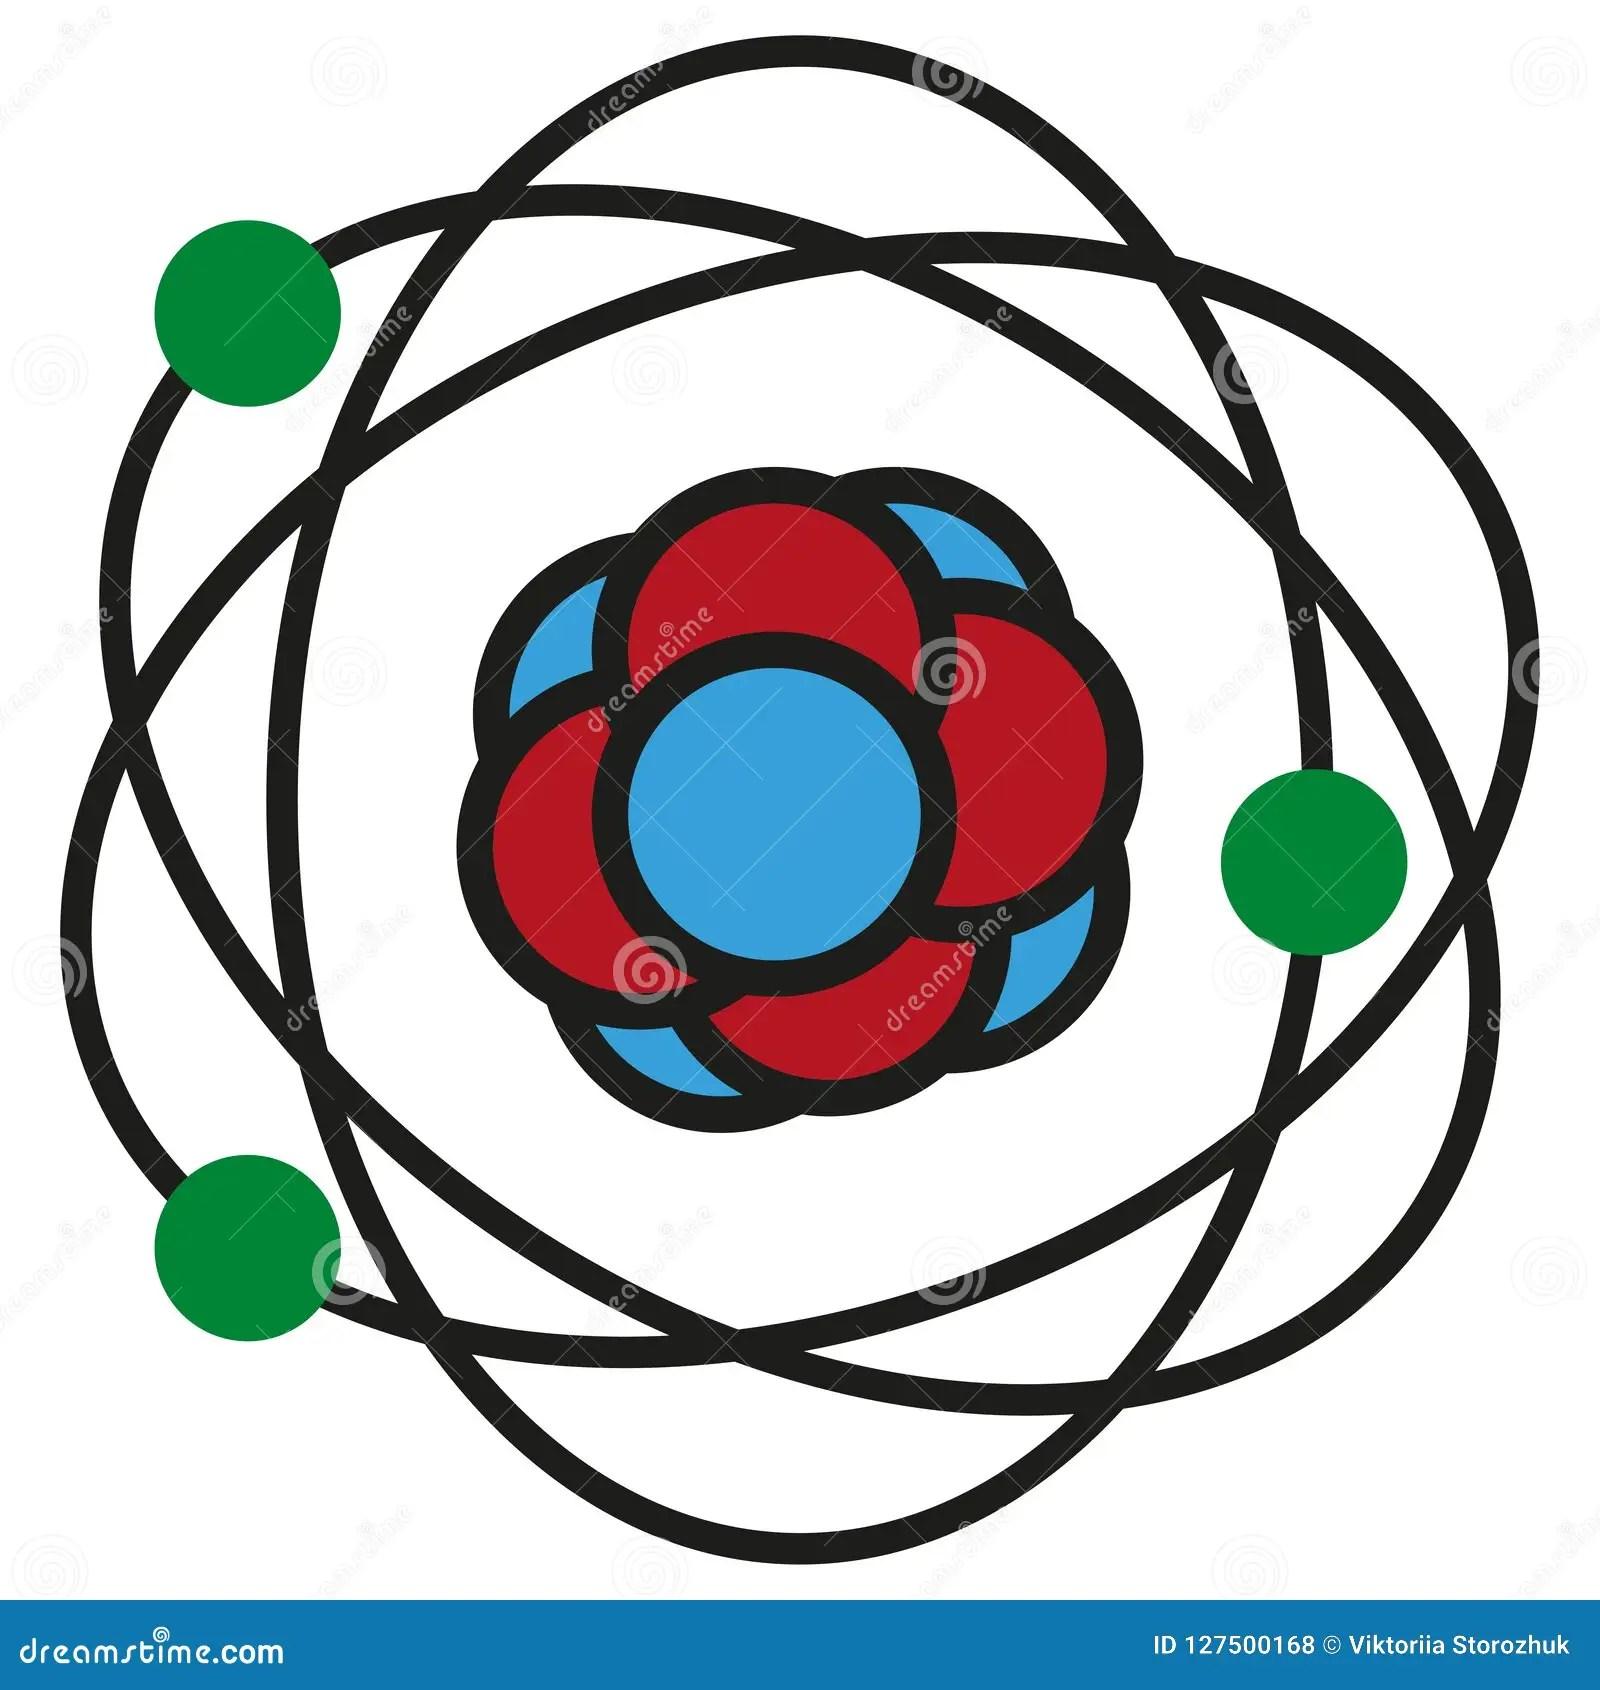 Simple Atom Symbol Molecule Concept Structure Of The